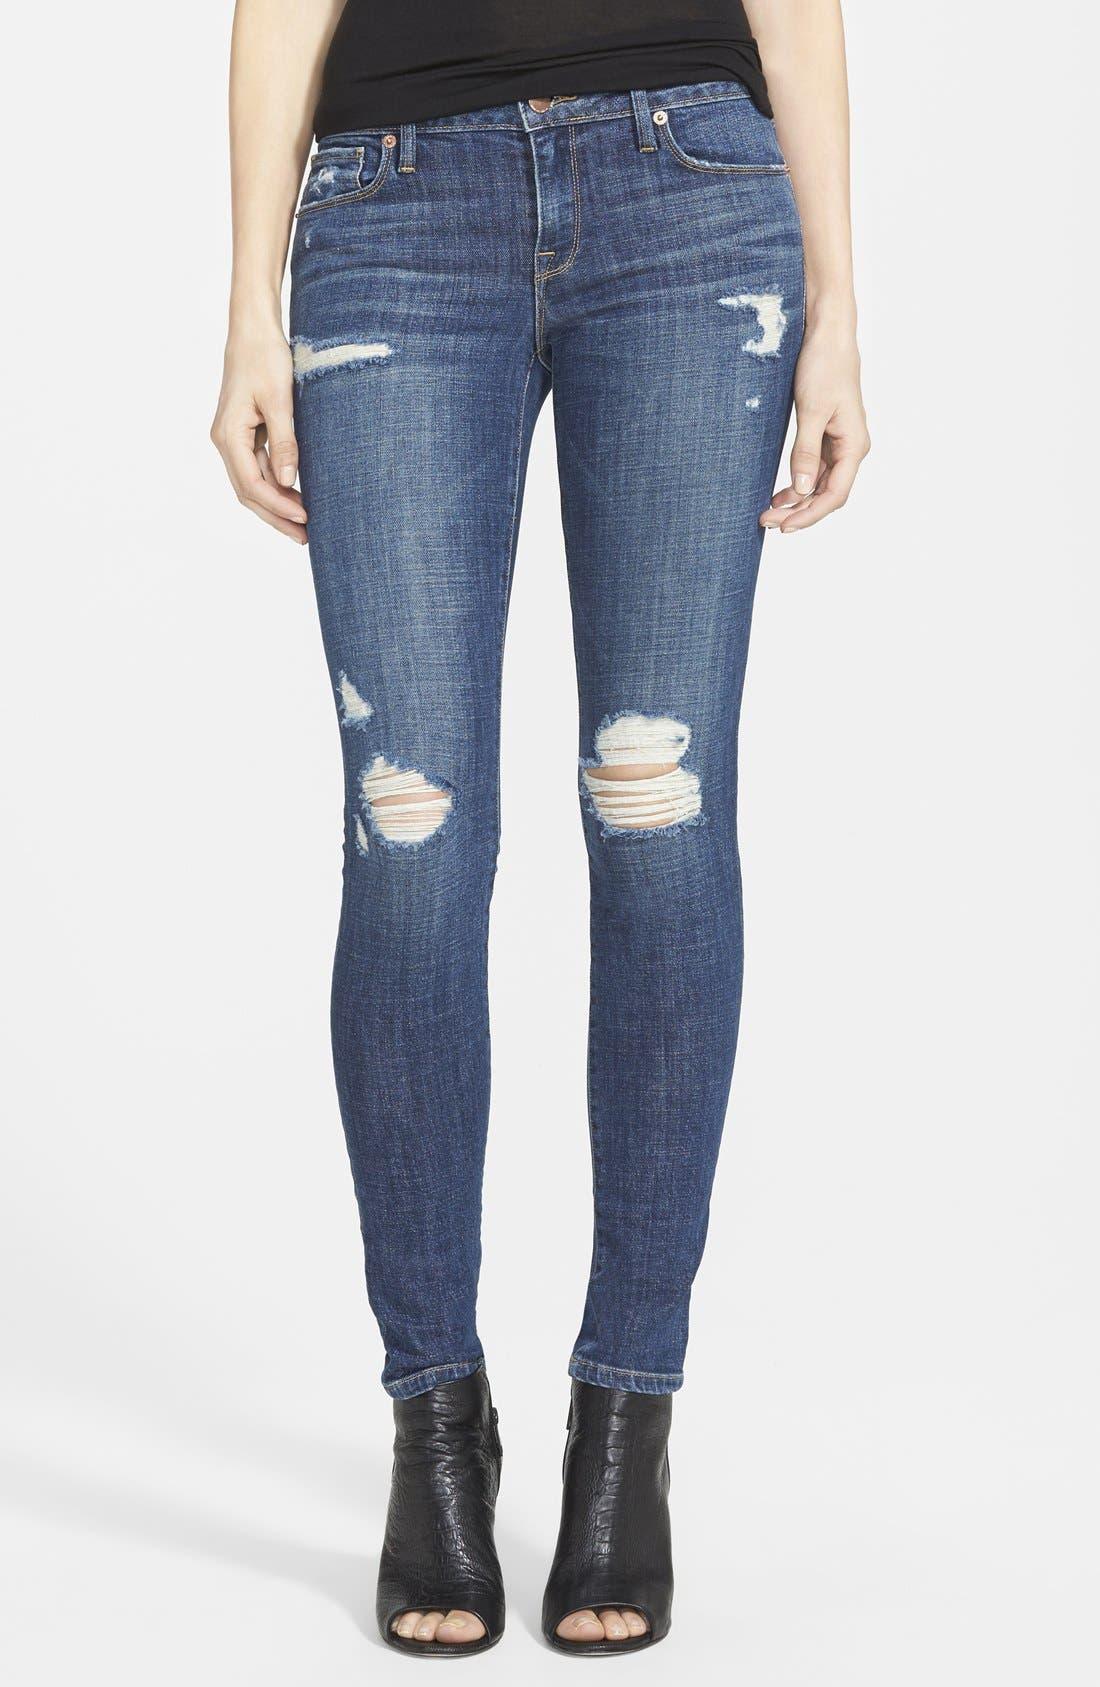 GENETIC 'Shya' Skinny Jeans, Main, color, 421